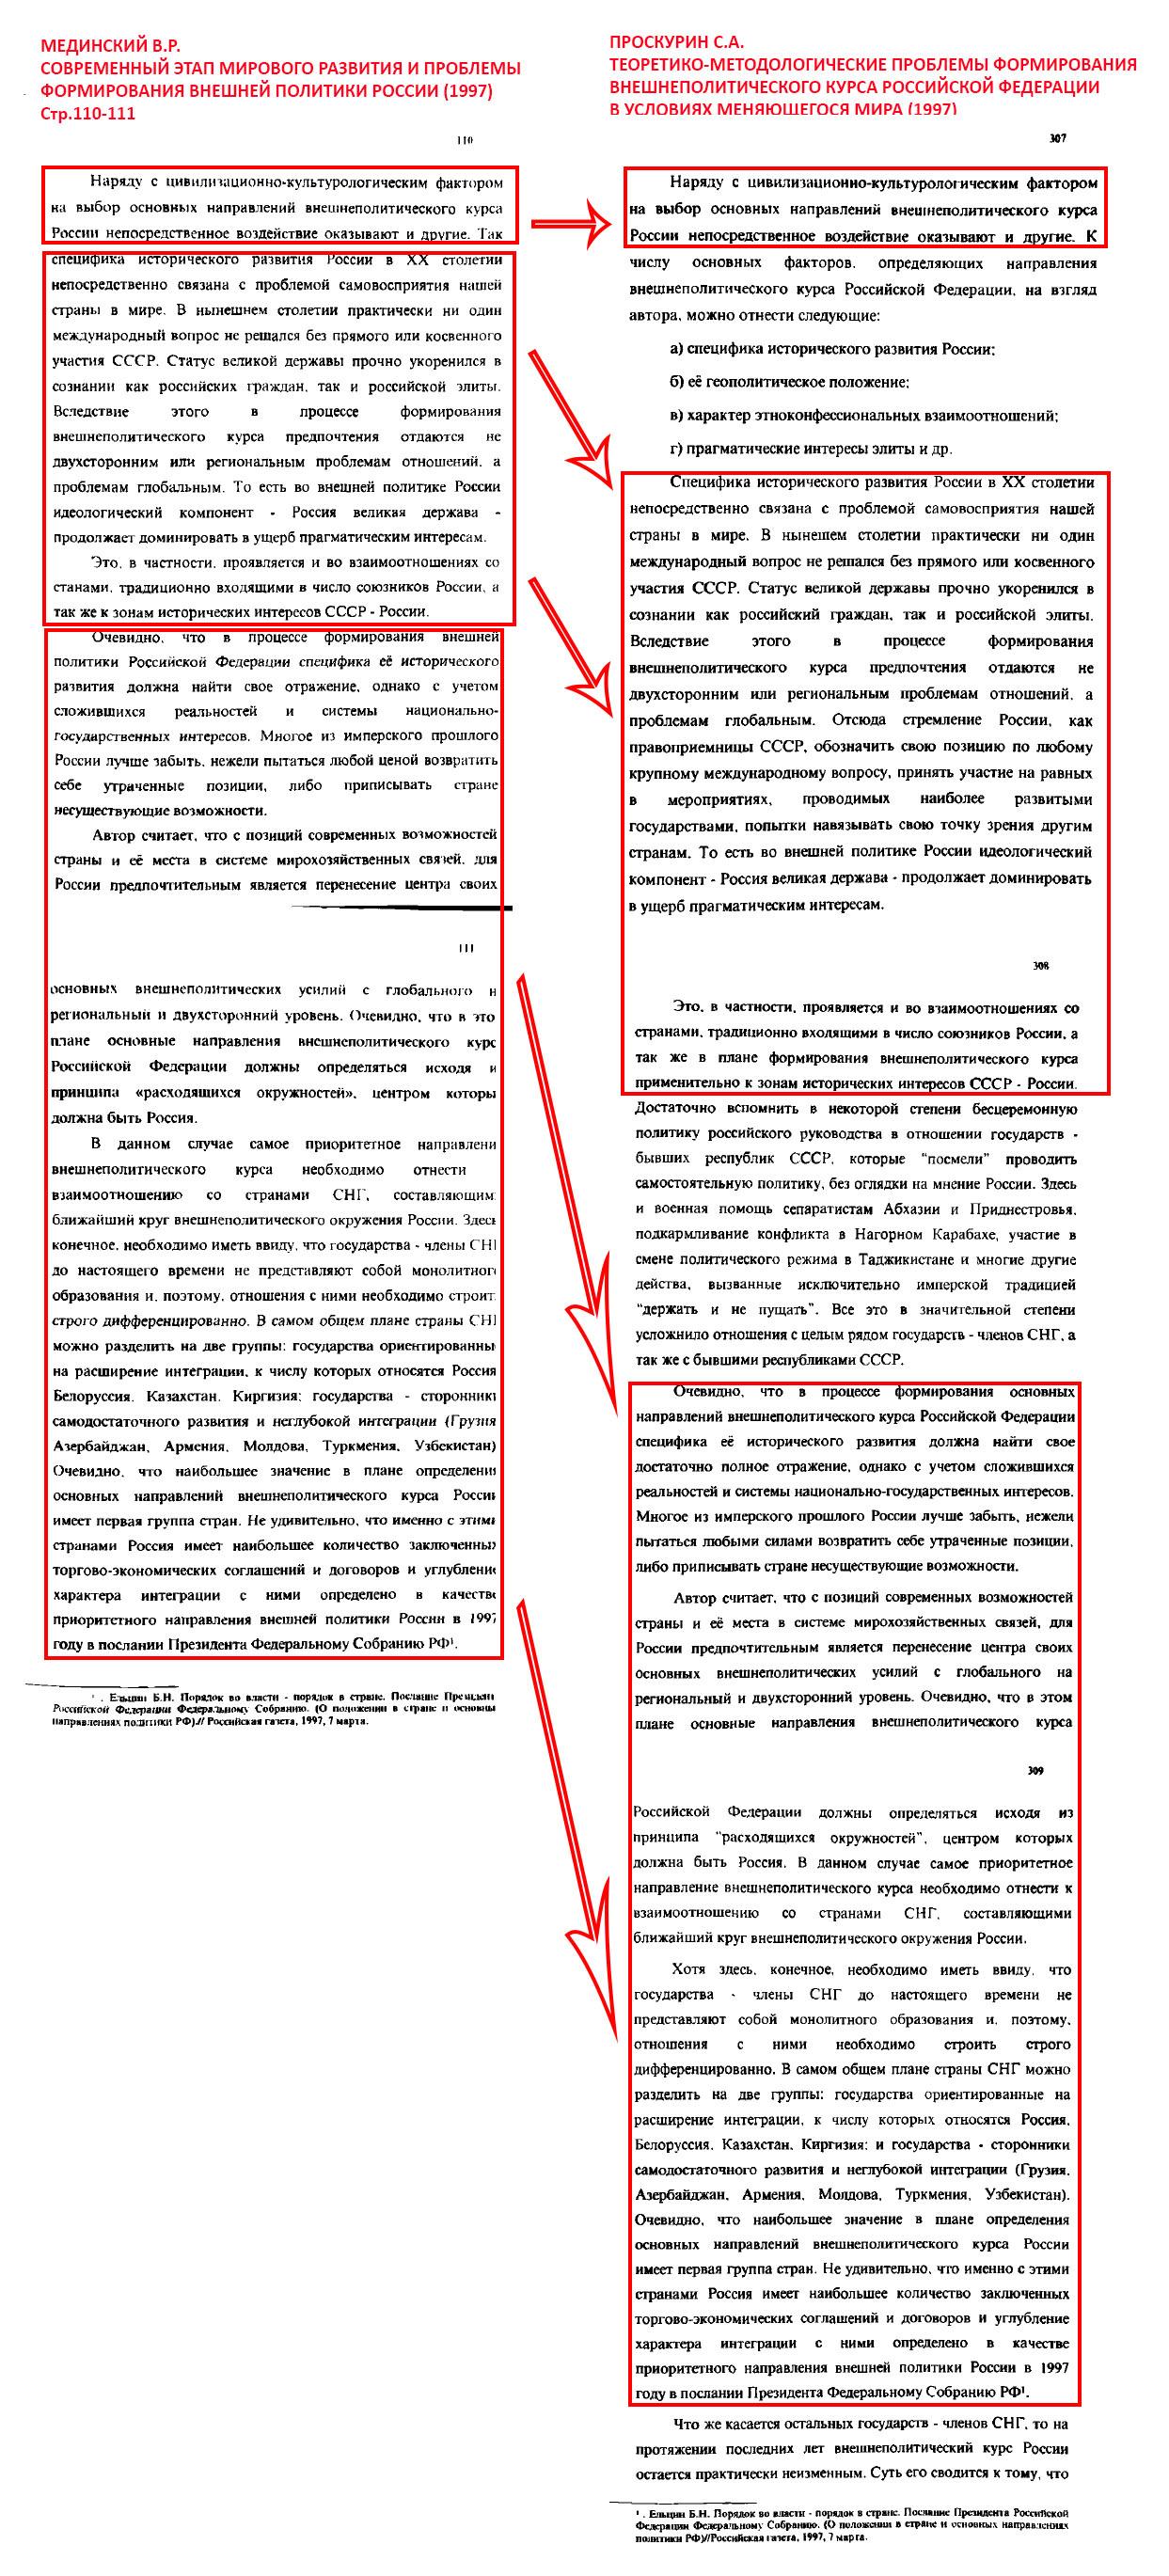 medinsky-pros-110